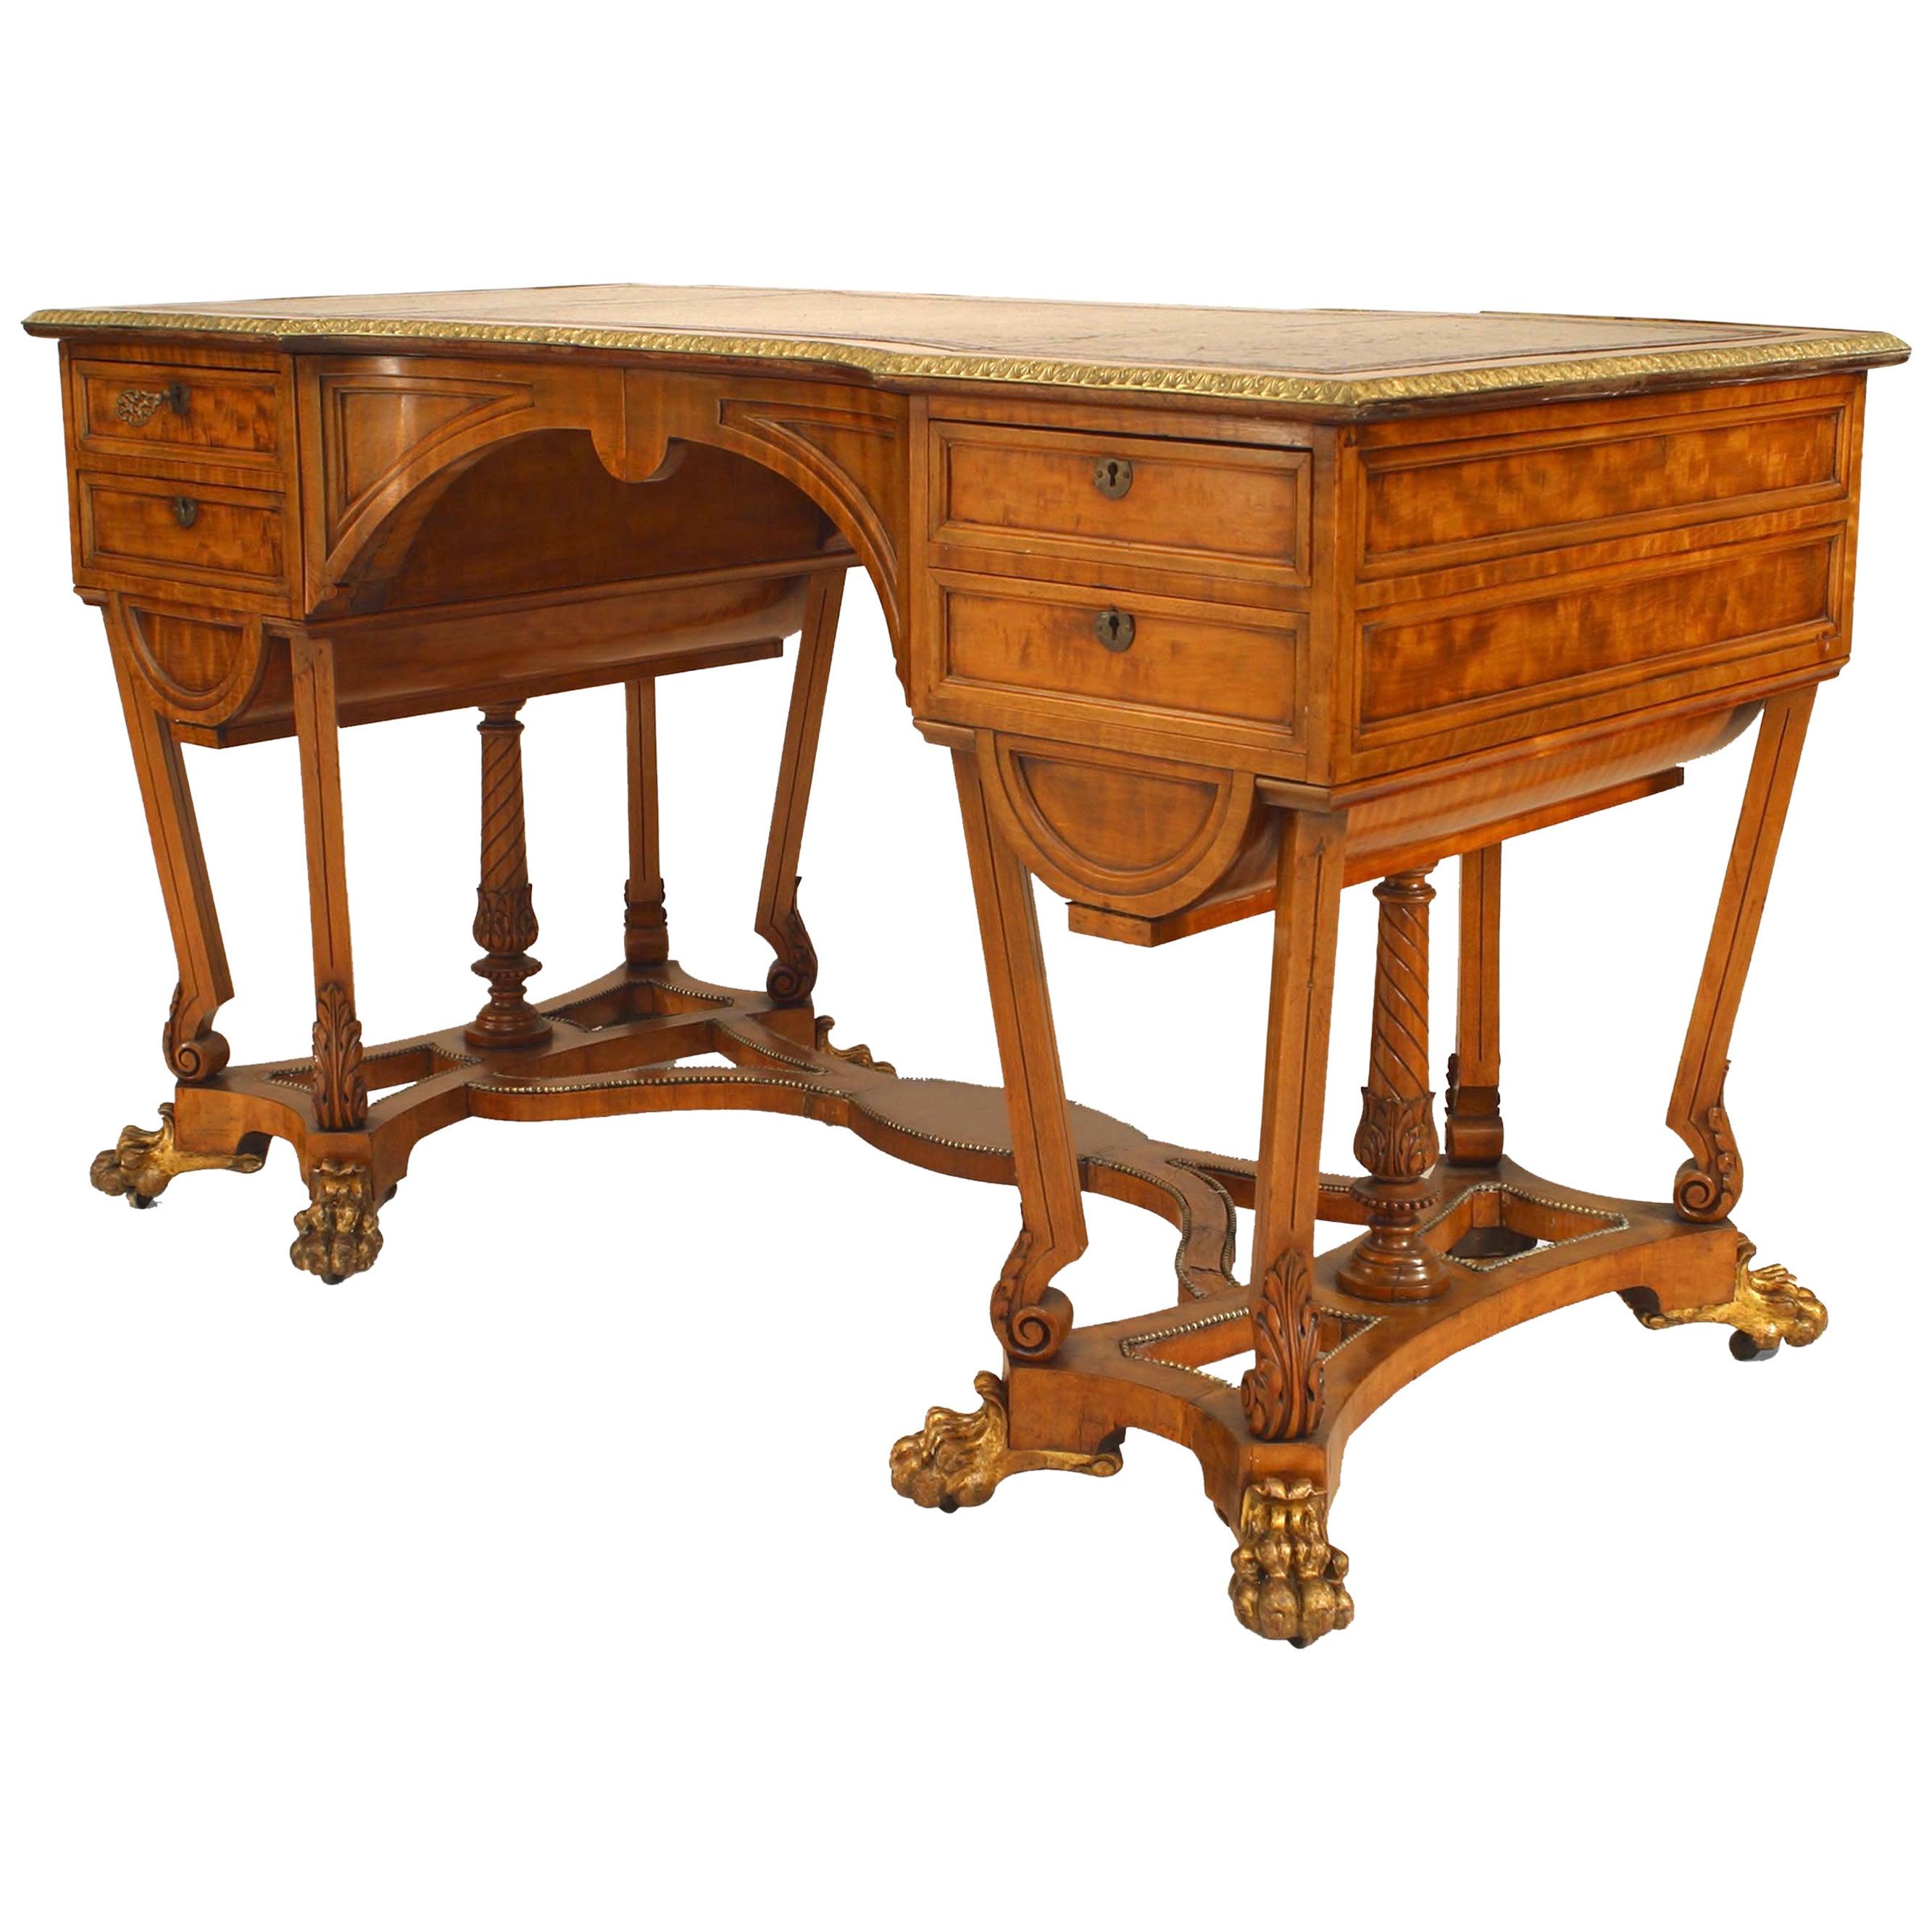 English Regency Style Gilt Metal Mounted Satinwood Desk